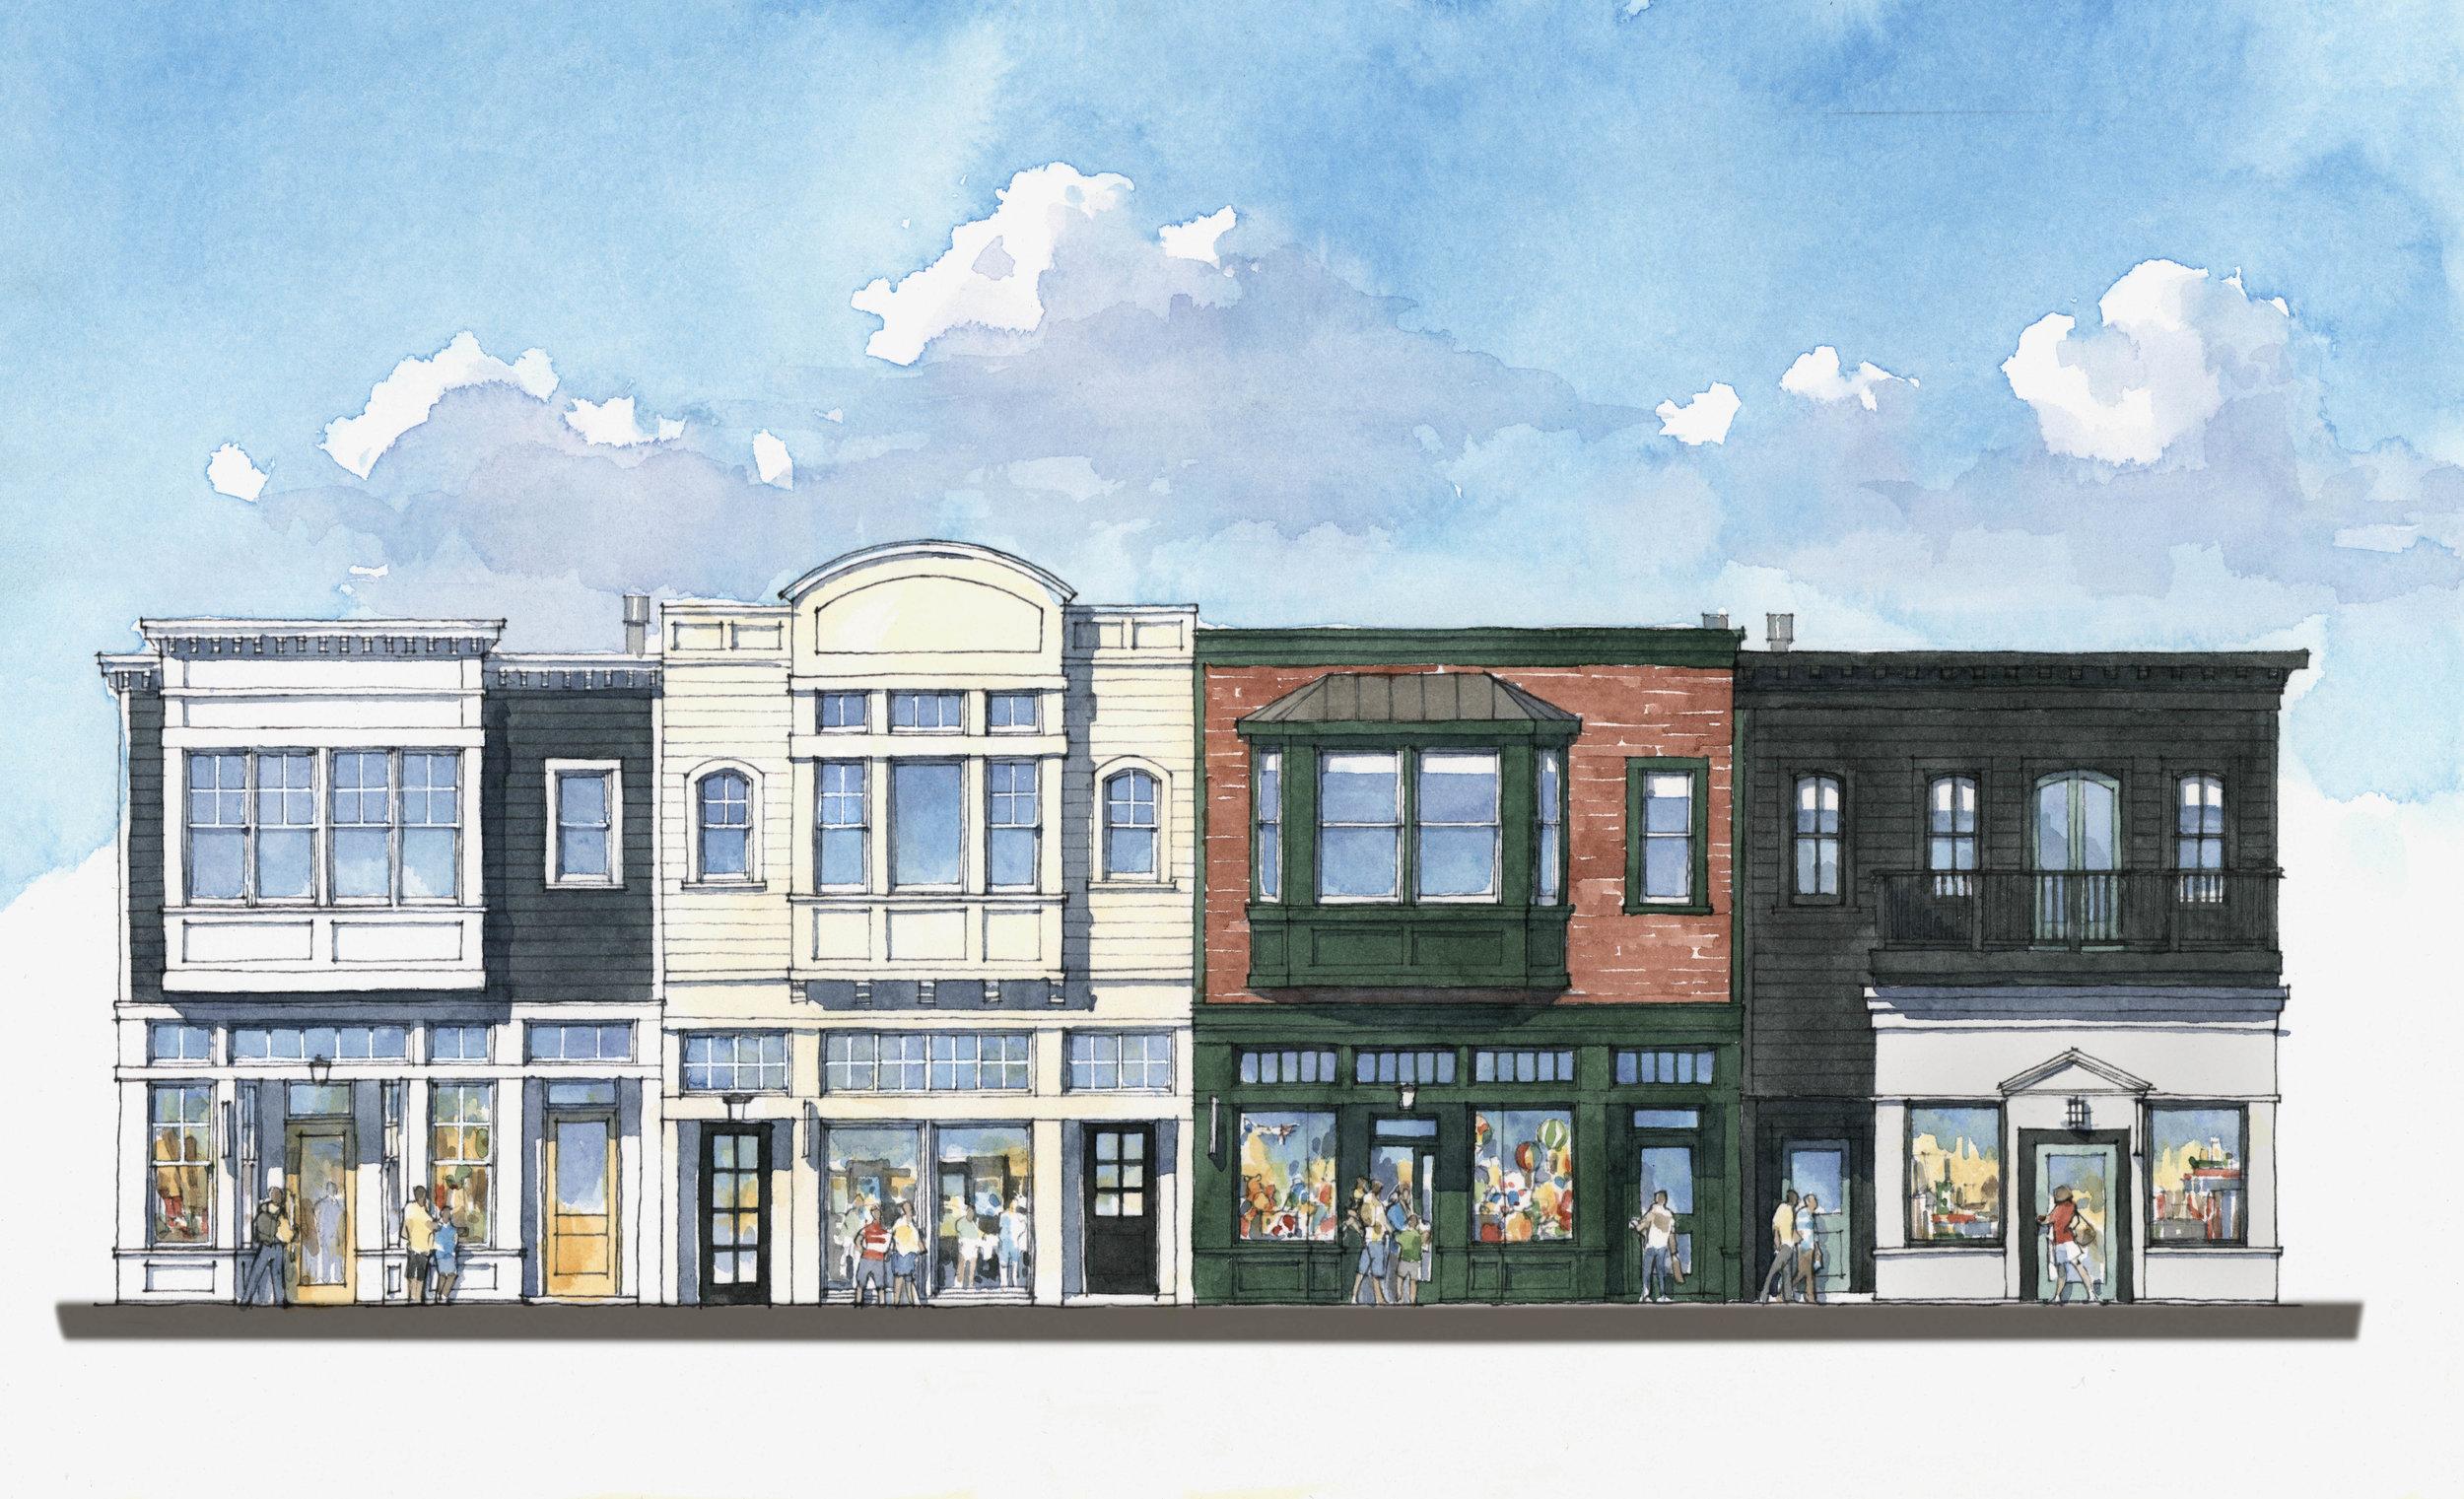 seabrook-town-center-paul-moon-design-commercial-residential.jpg